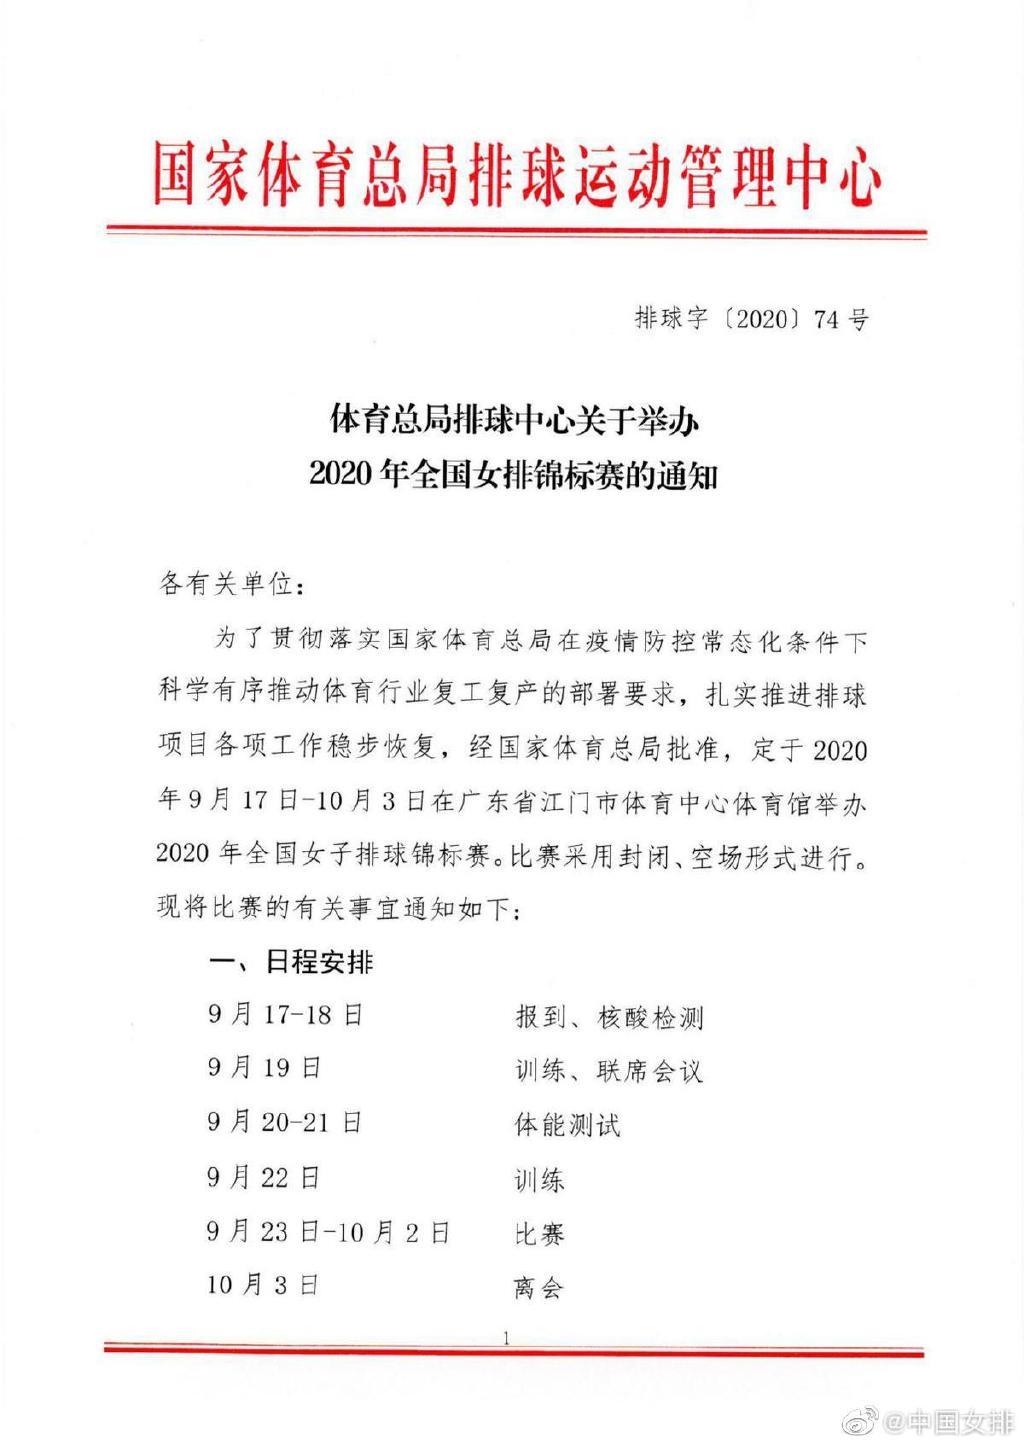 http://www.21gdl.com/guangdongxinwen/358360.html